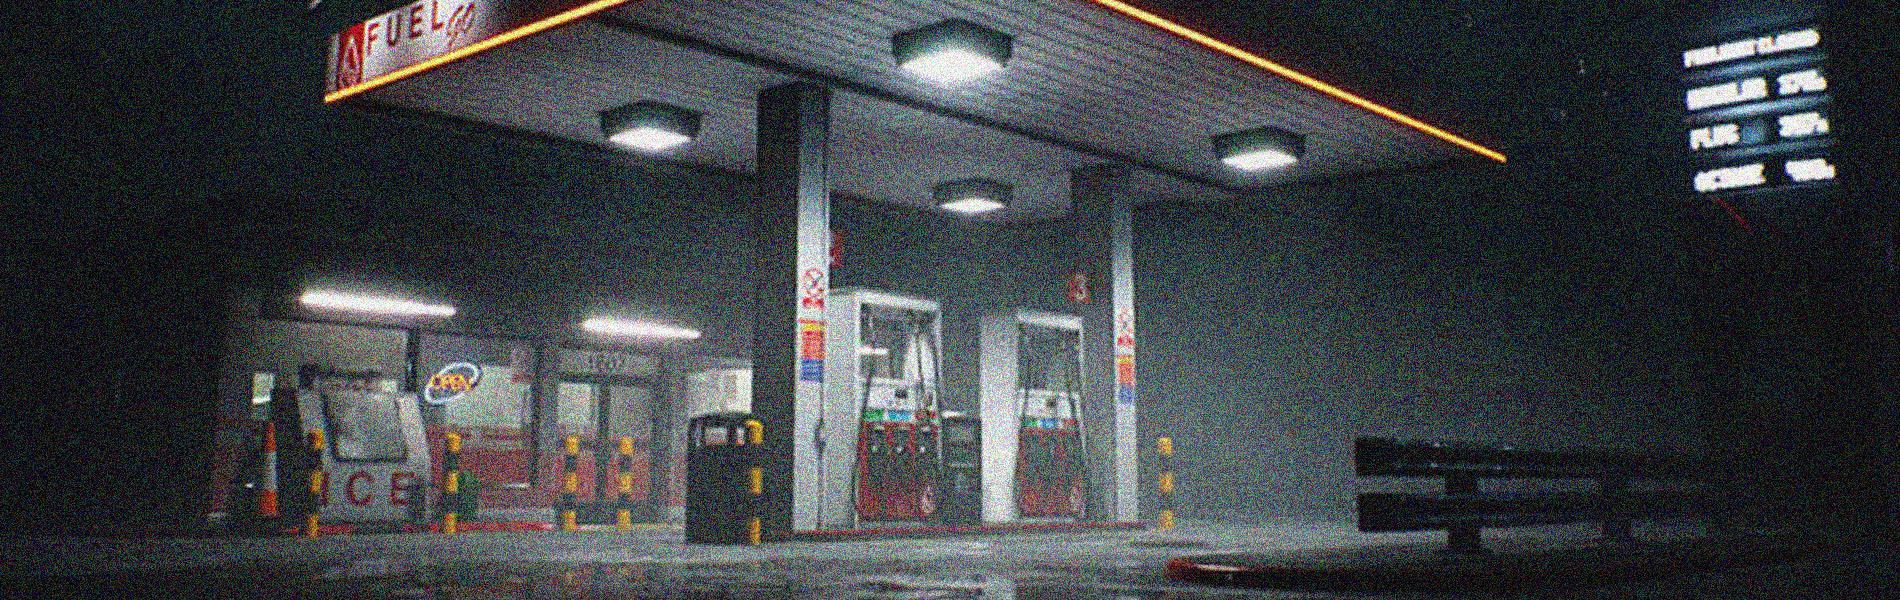 Petrolandia – The First Robbery